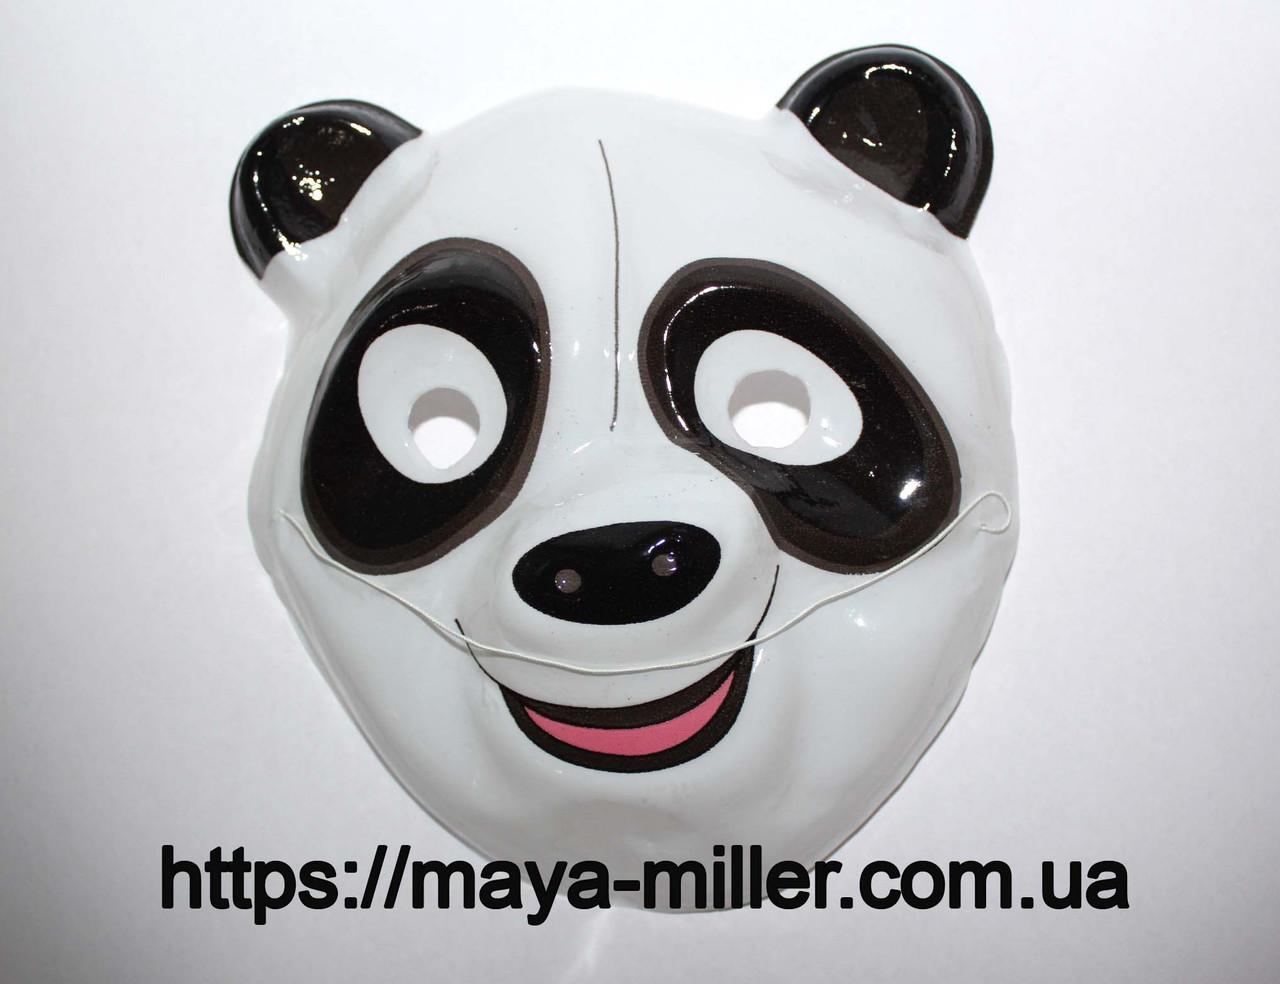 Маска детская Панда  (тонкий пластик)      Майя Миллер